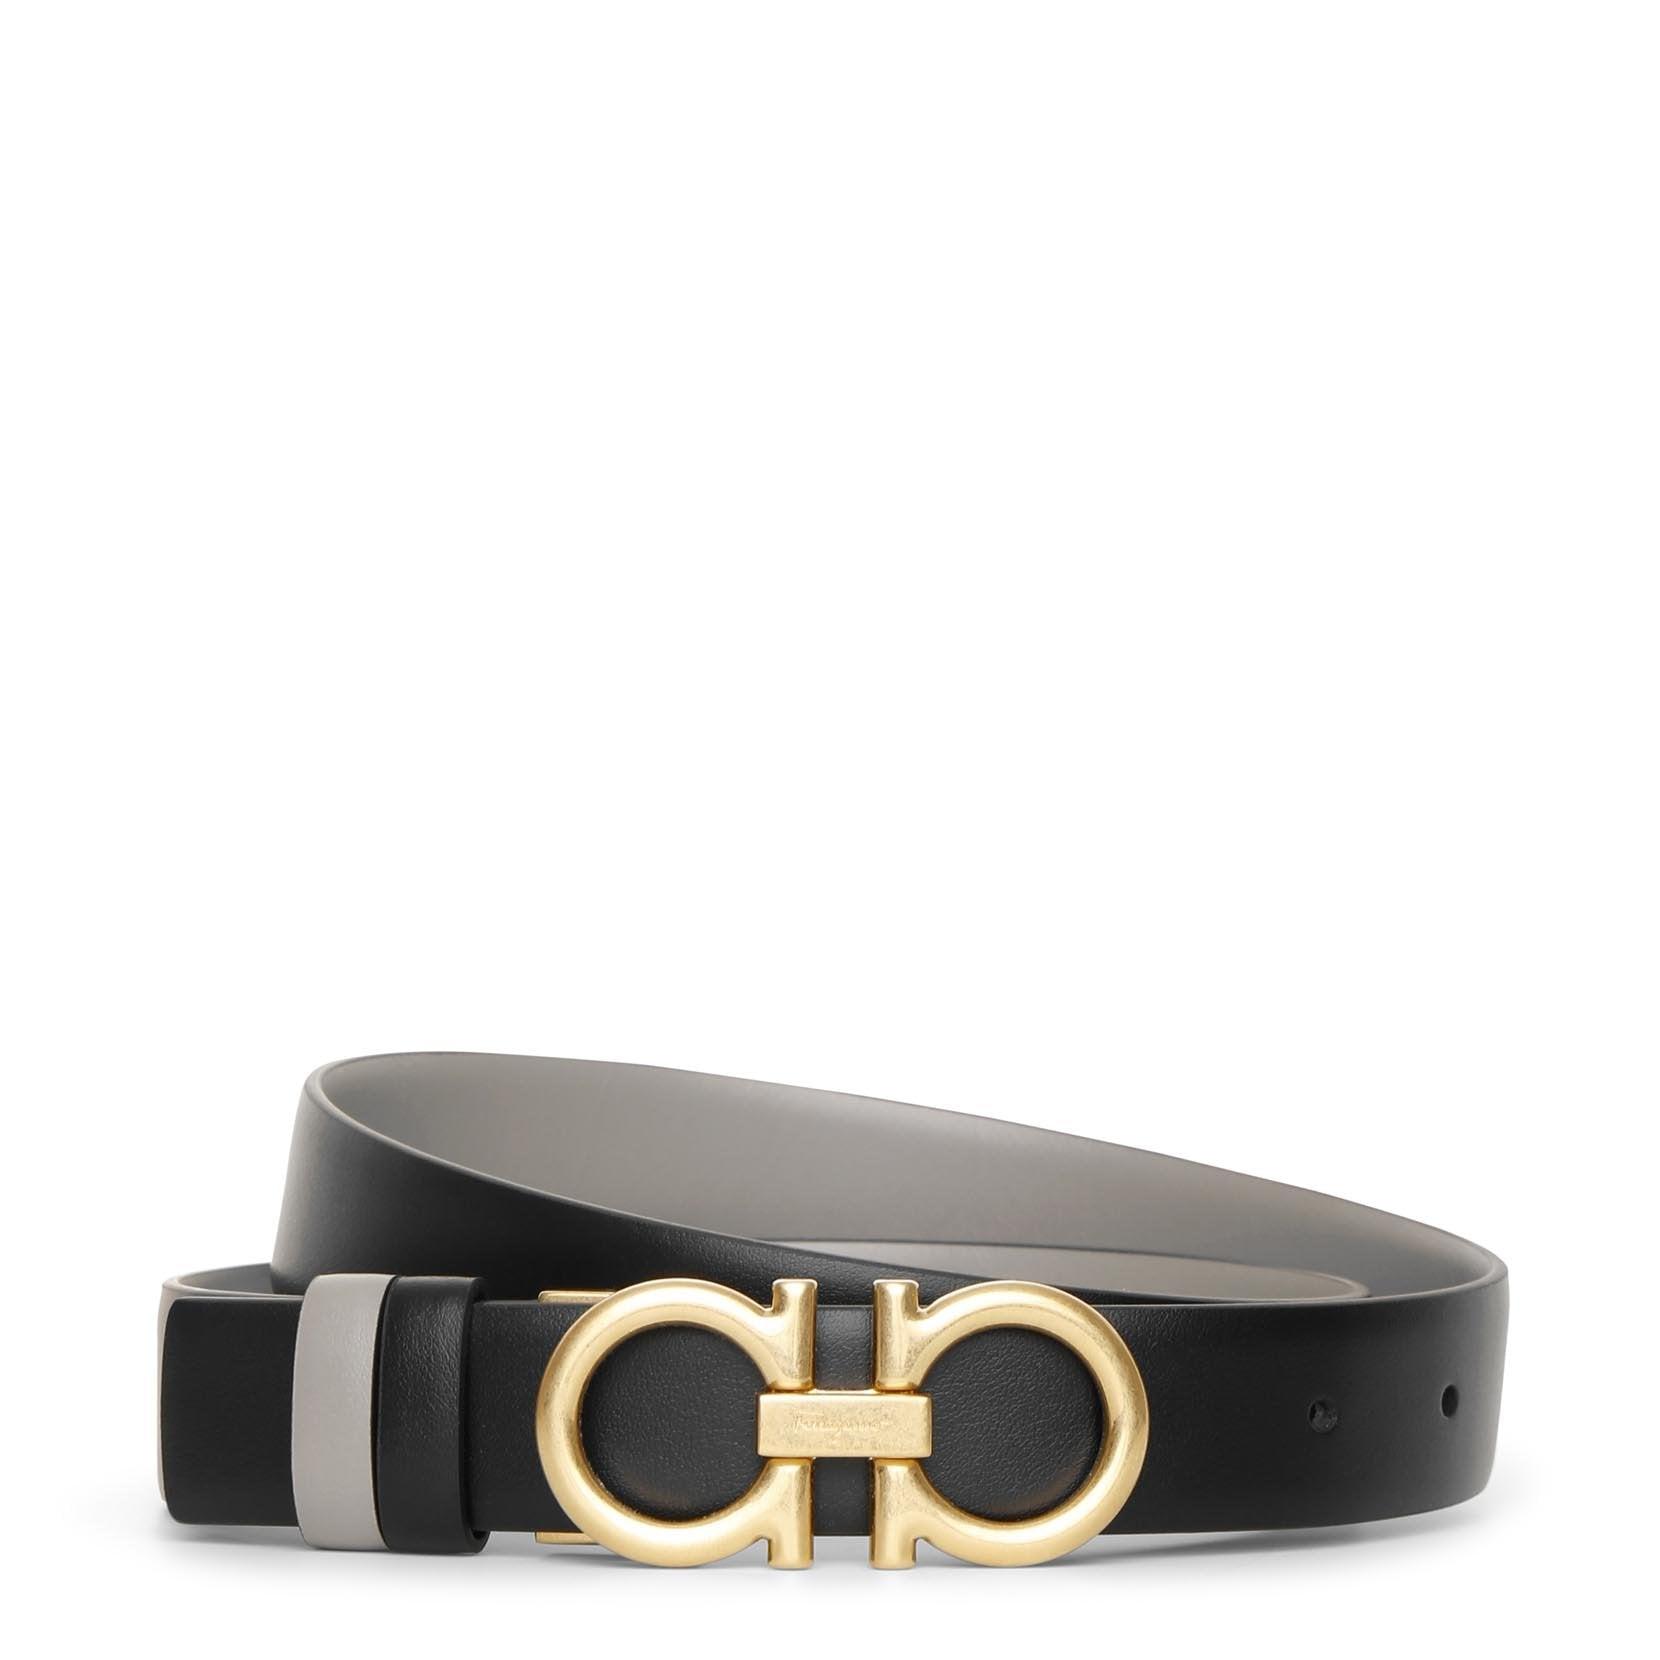 Salvatore Ferragamo Reversable and adjustable grey black leather belt  - black/grey - female - Size: 85